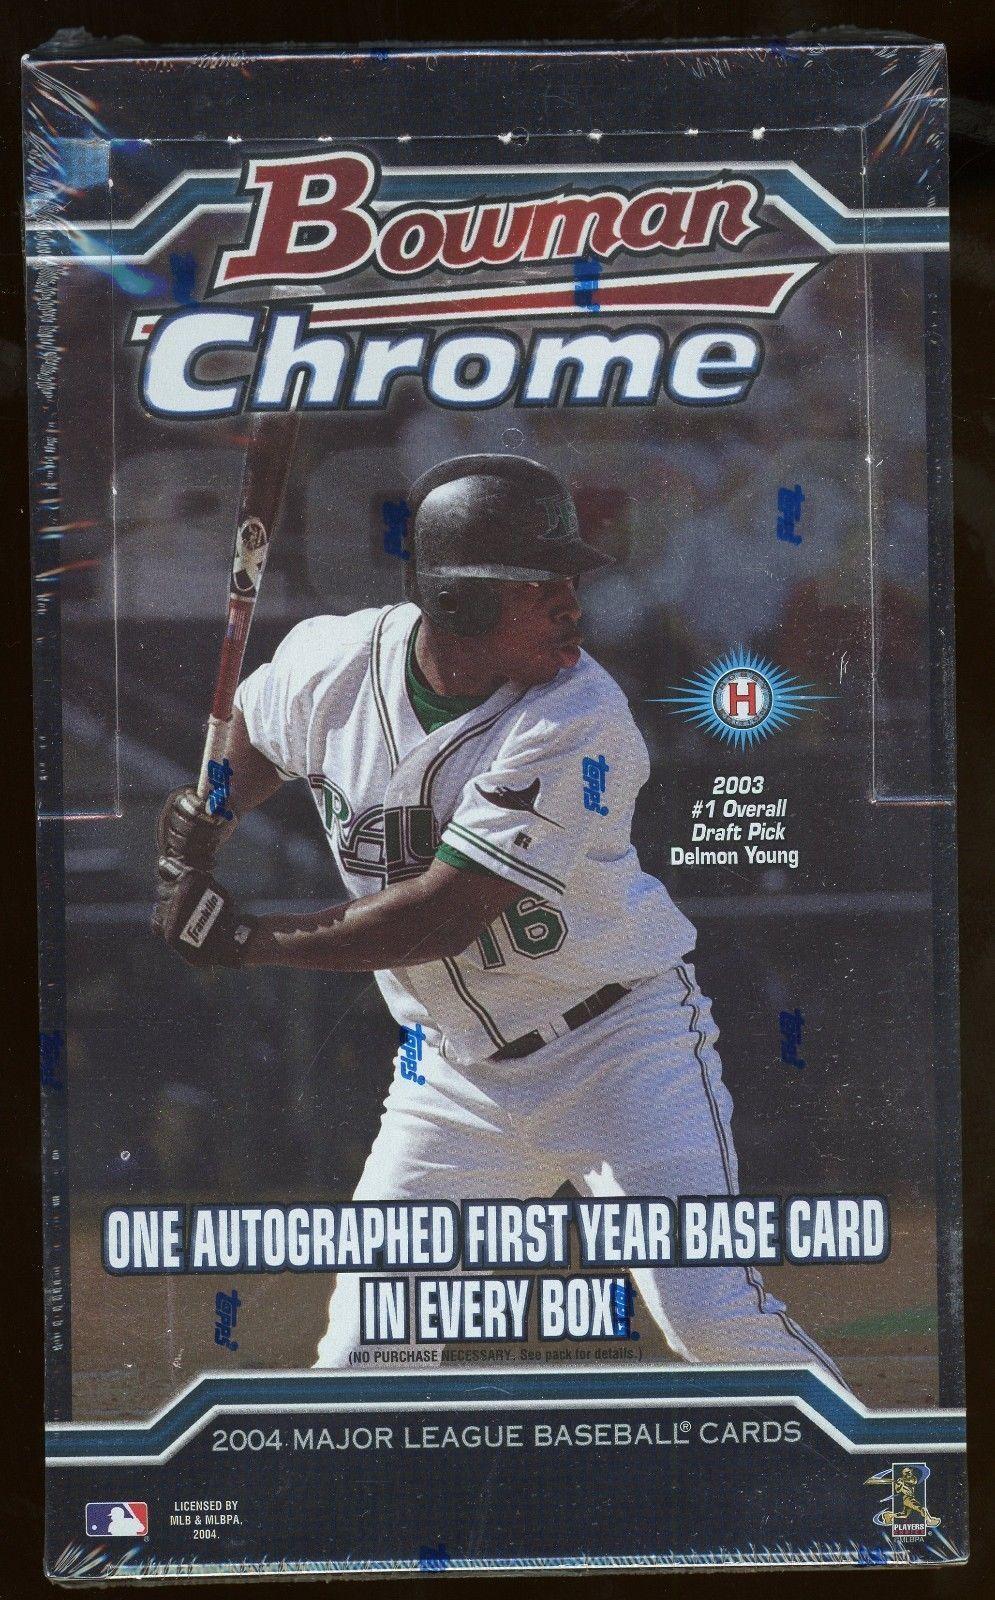 2004 bowman chrome baseball factory sealed hobby box